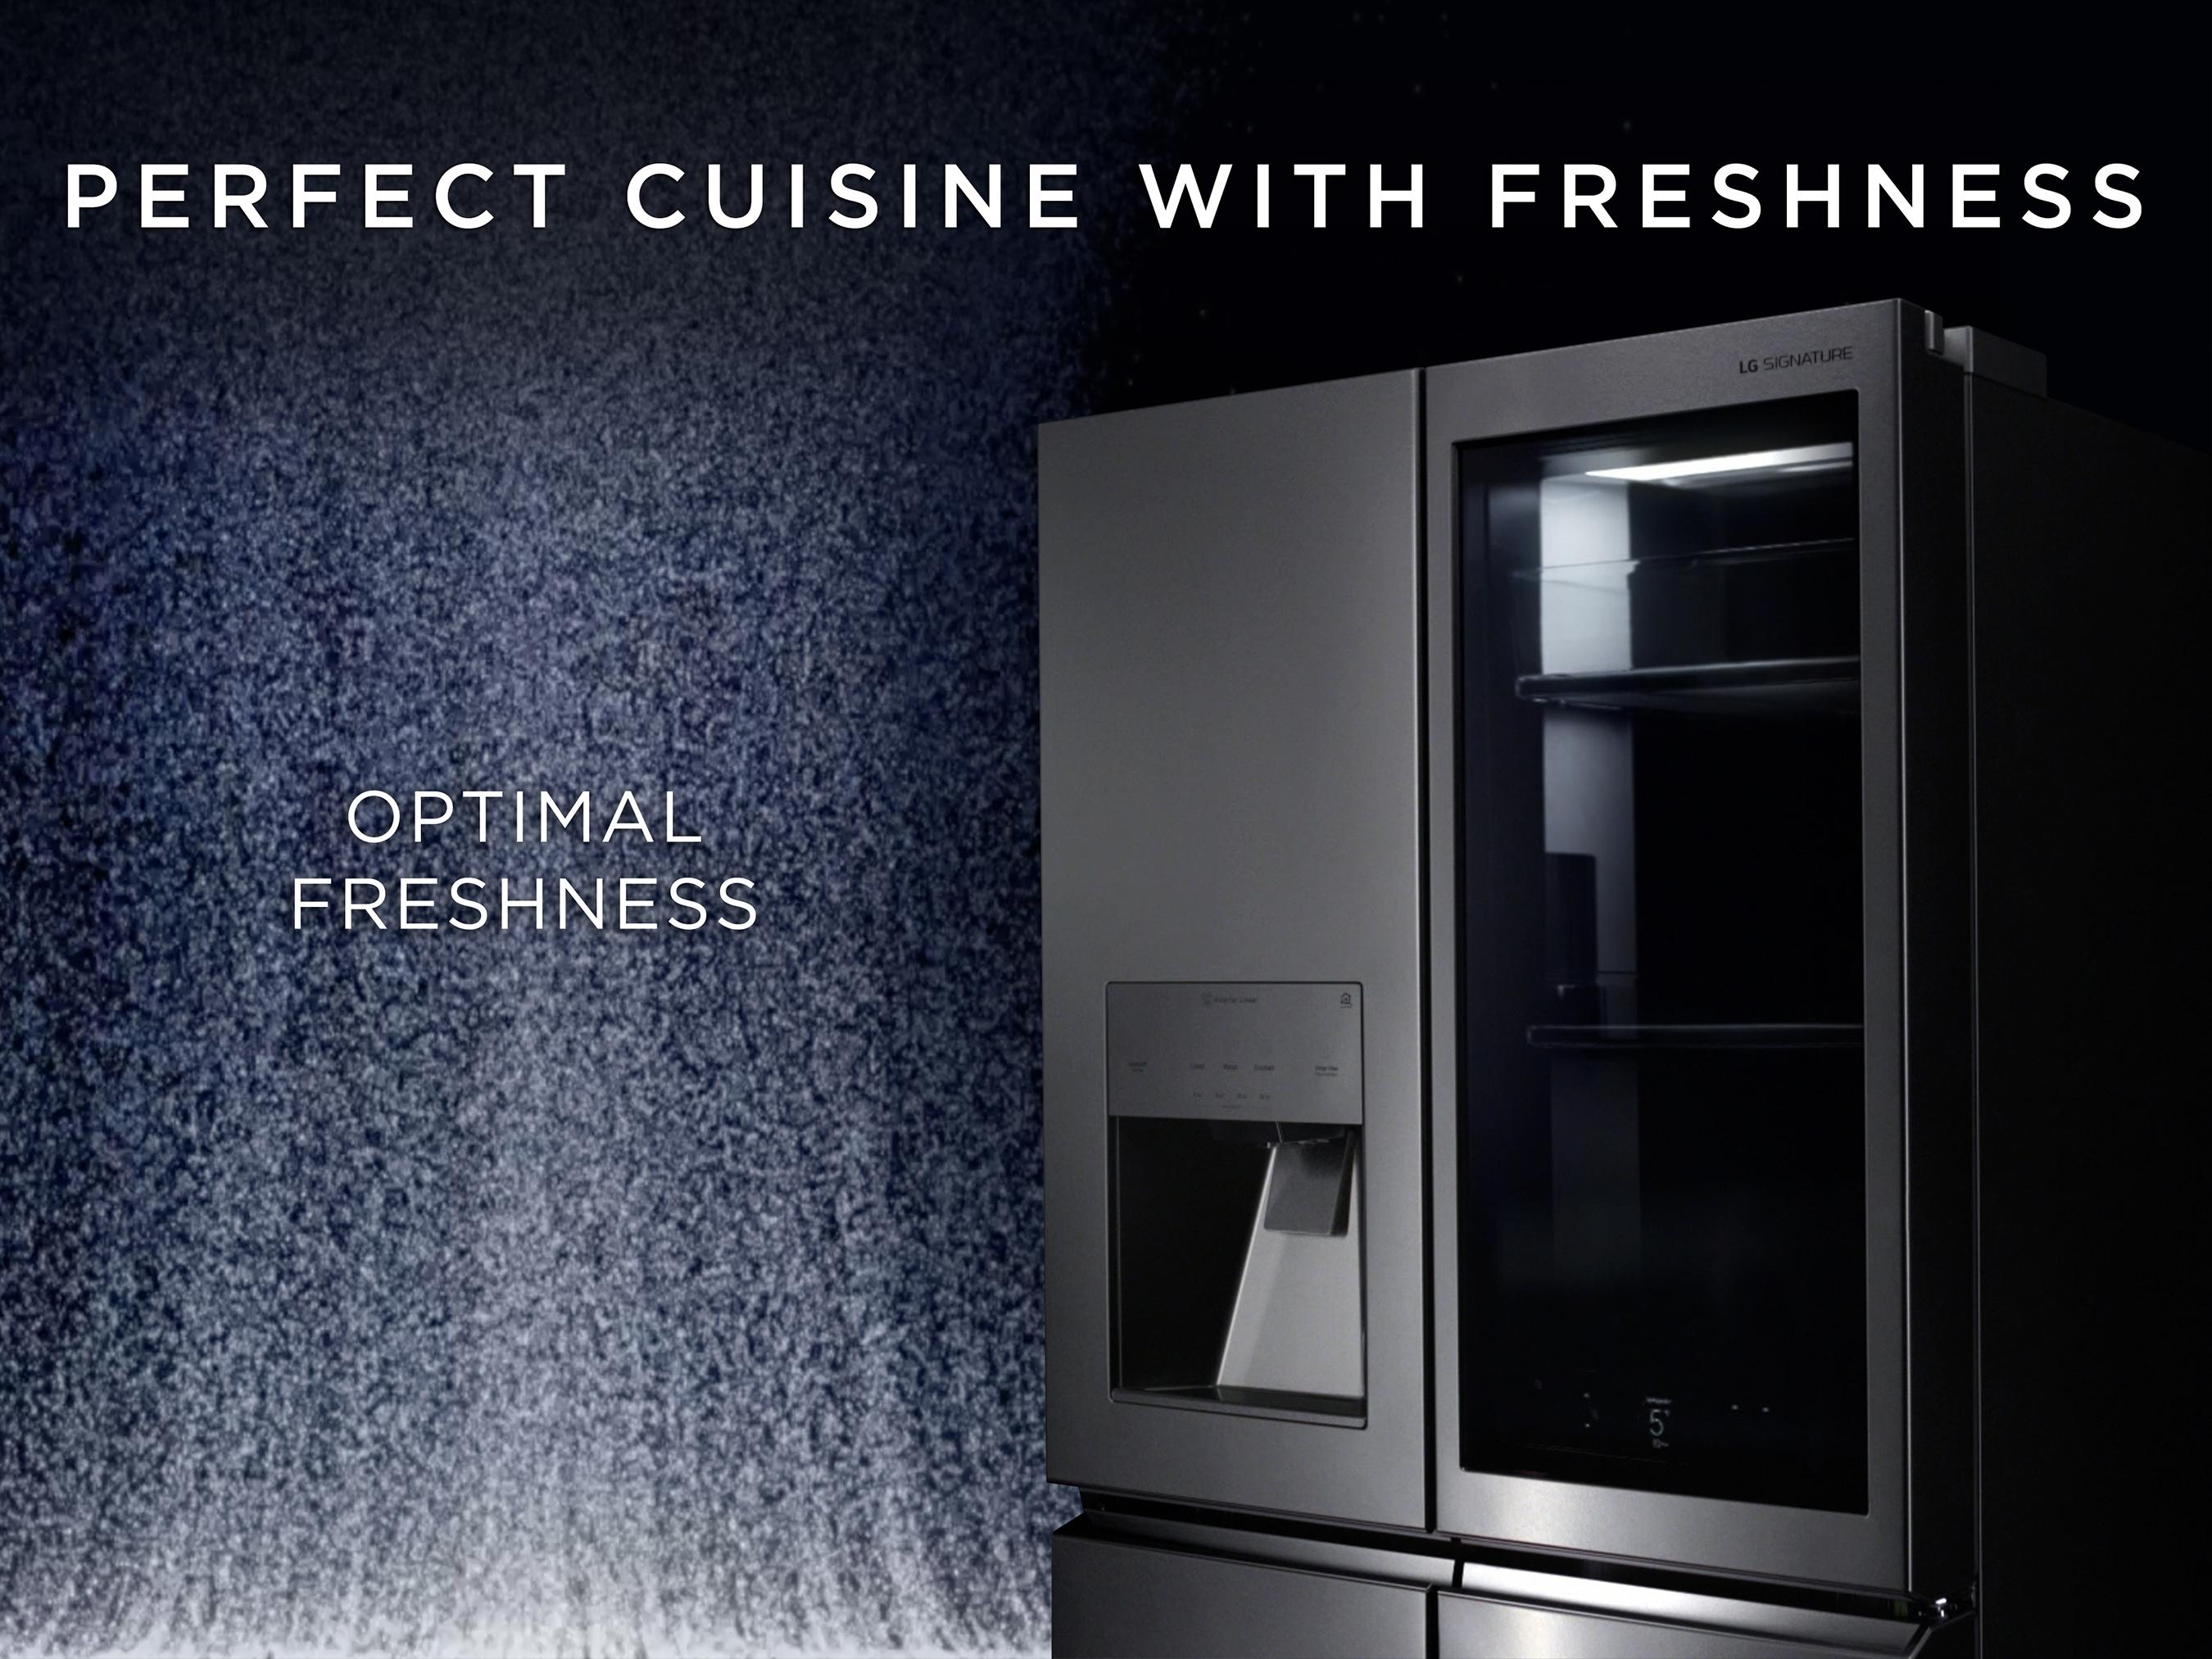 LG SIGNATURE Digital Ad-Refrigerator